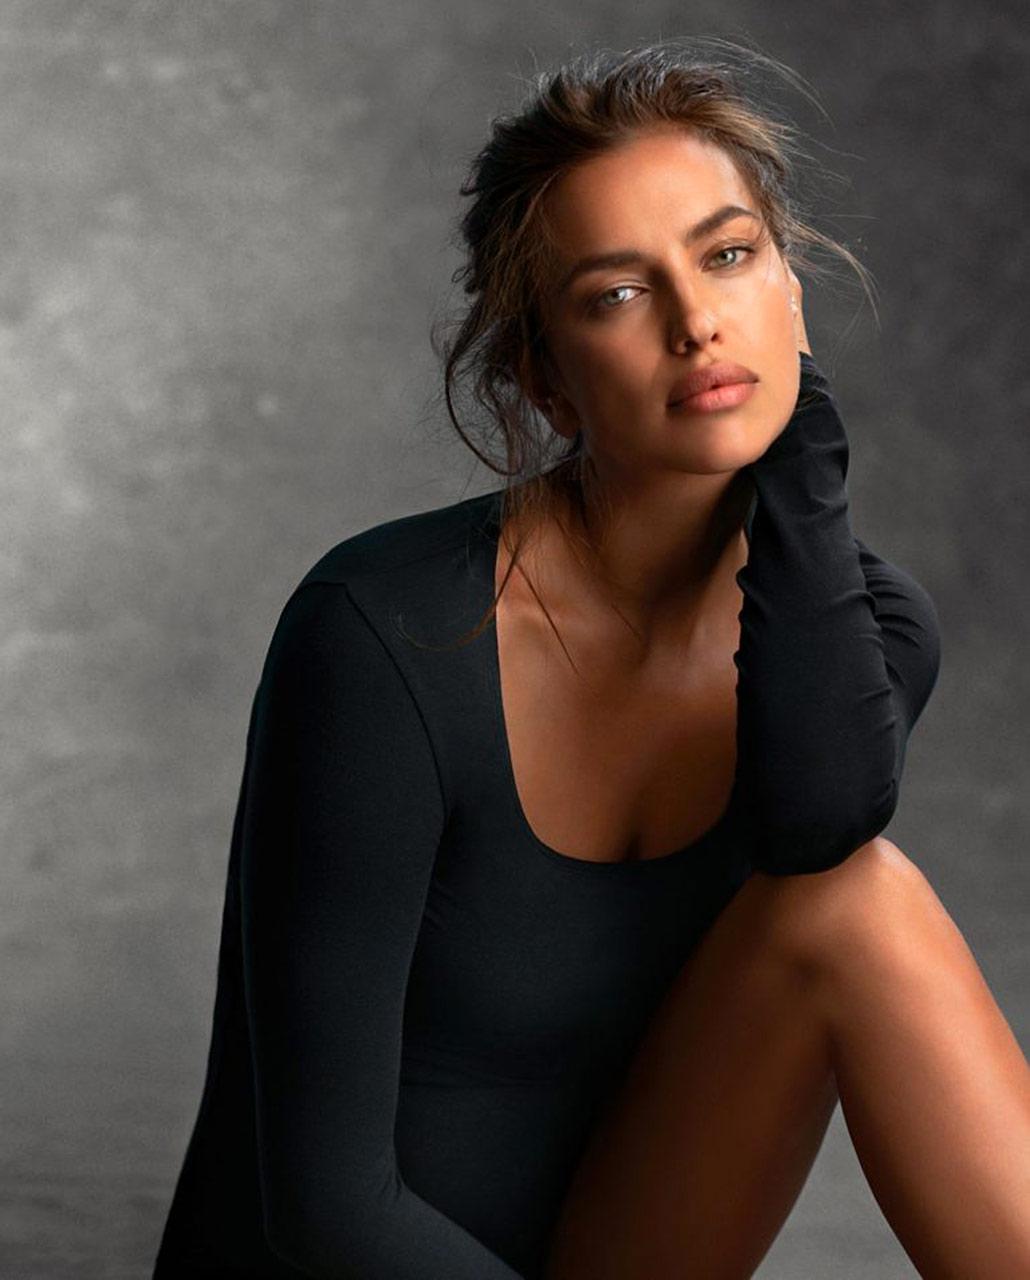 Irina Shayk ( Bradley Coopers Wife ) Nude & Topless After